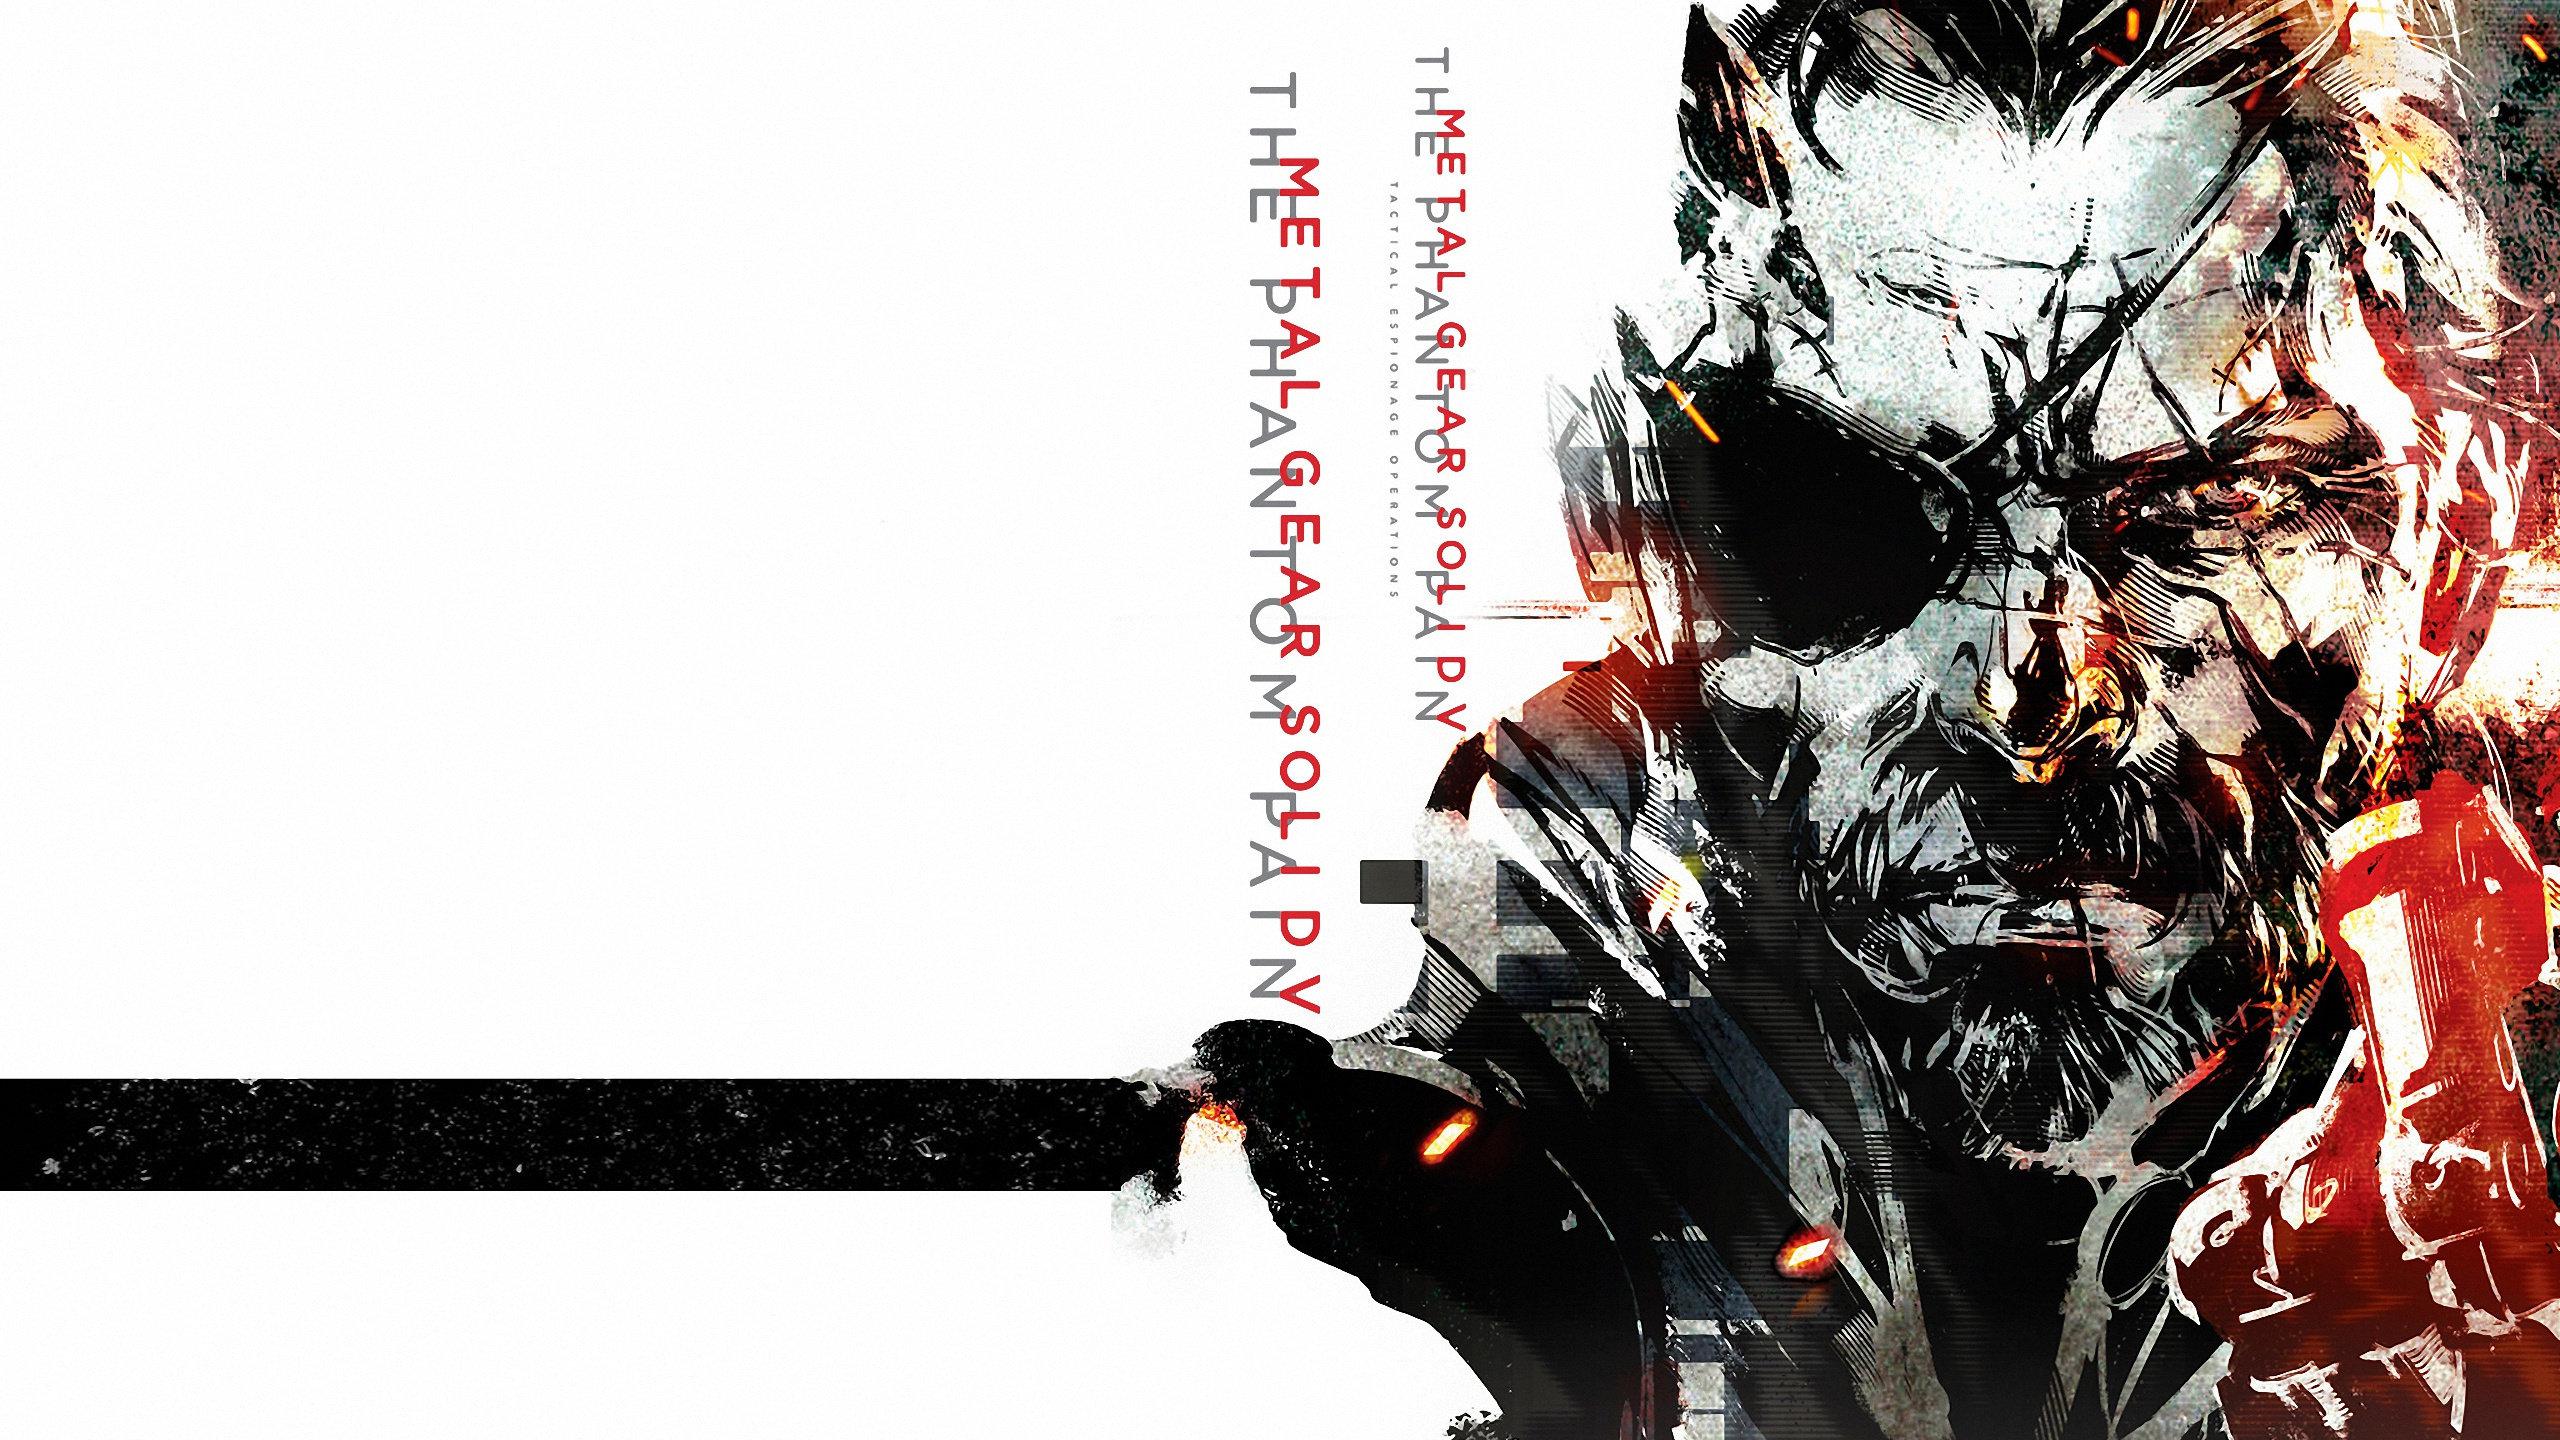 Metal Gear Solid 5 V The Phantom Pain Mgsv 5 Wallpapers Hd